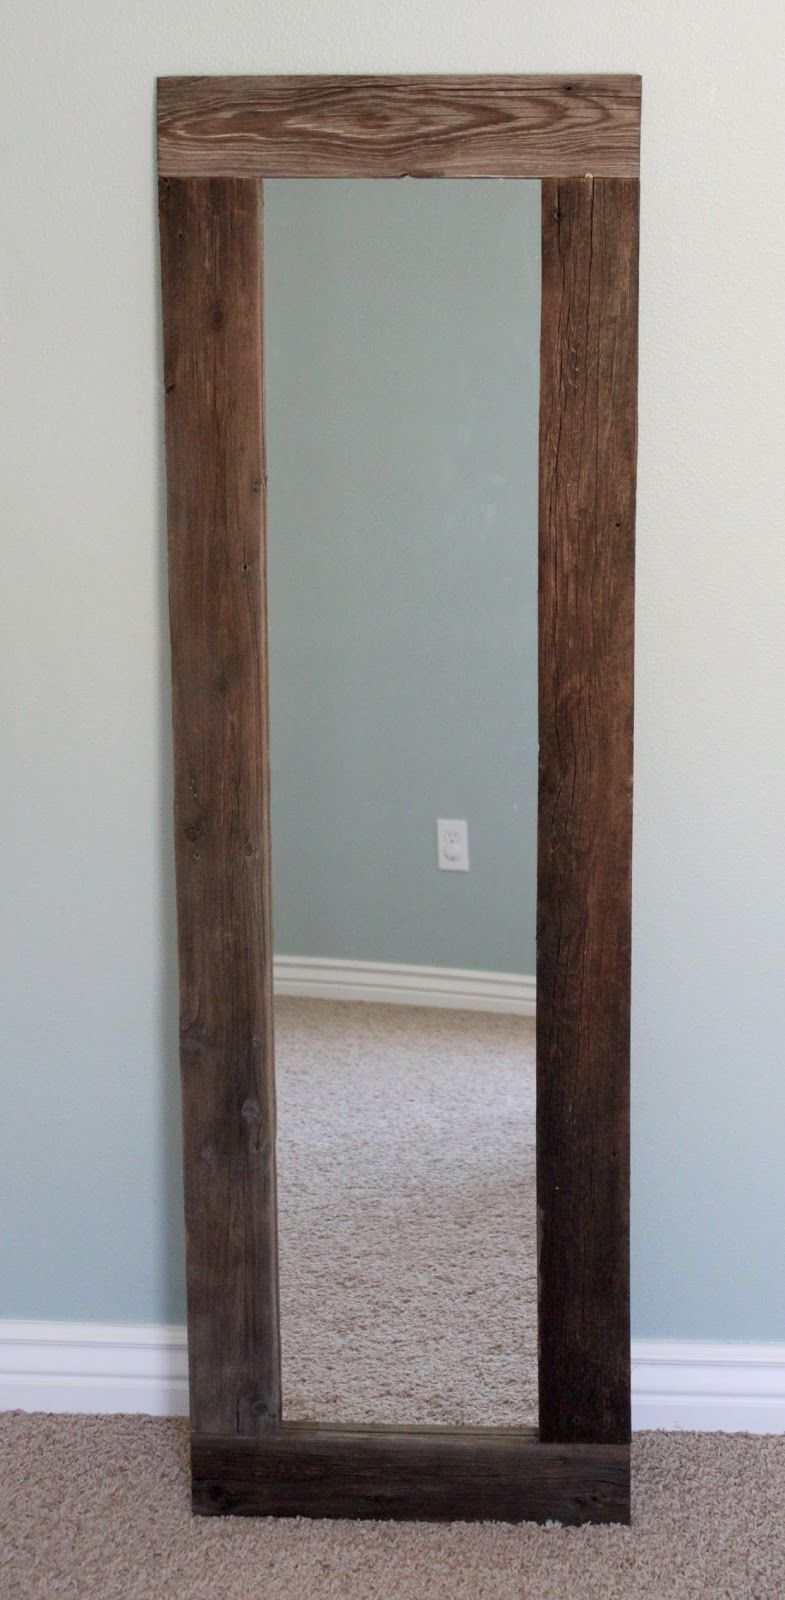 Diy reclaimed wood framed mirror wood framed mirror